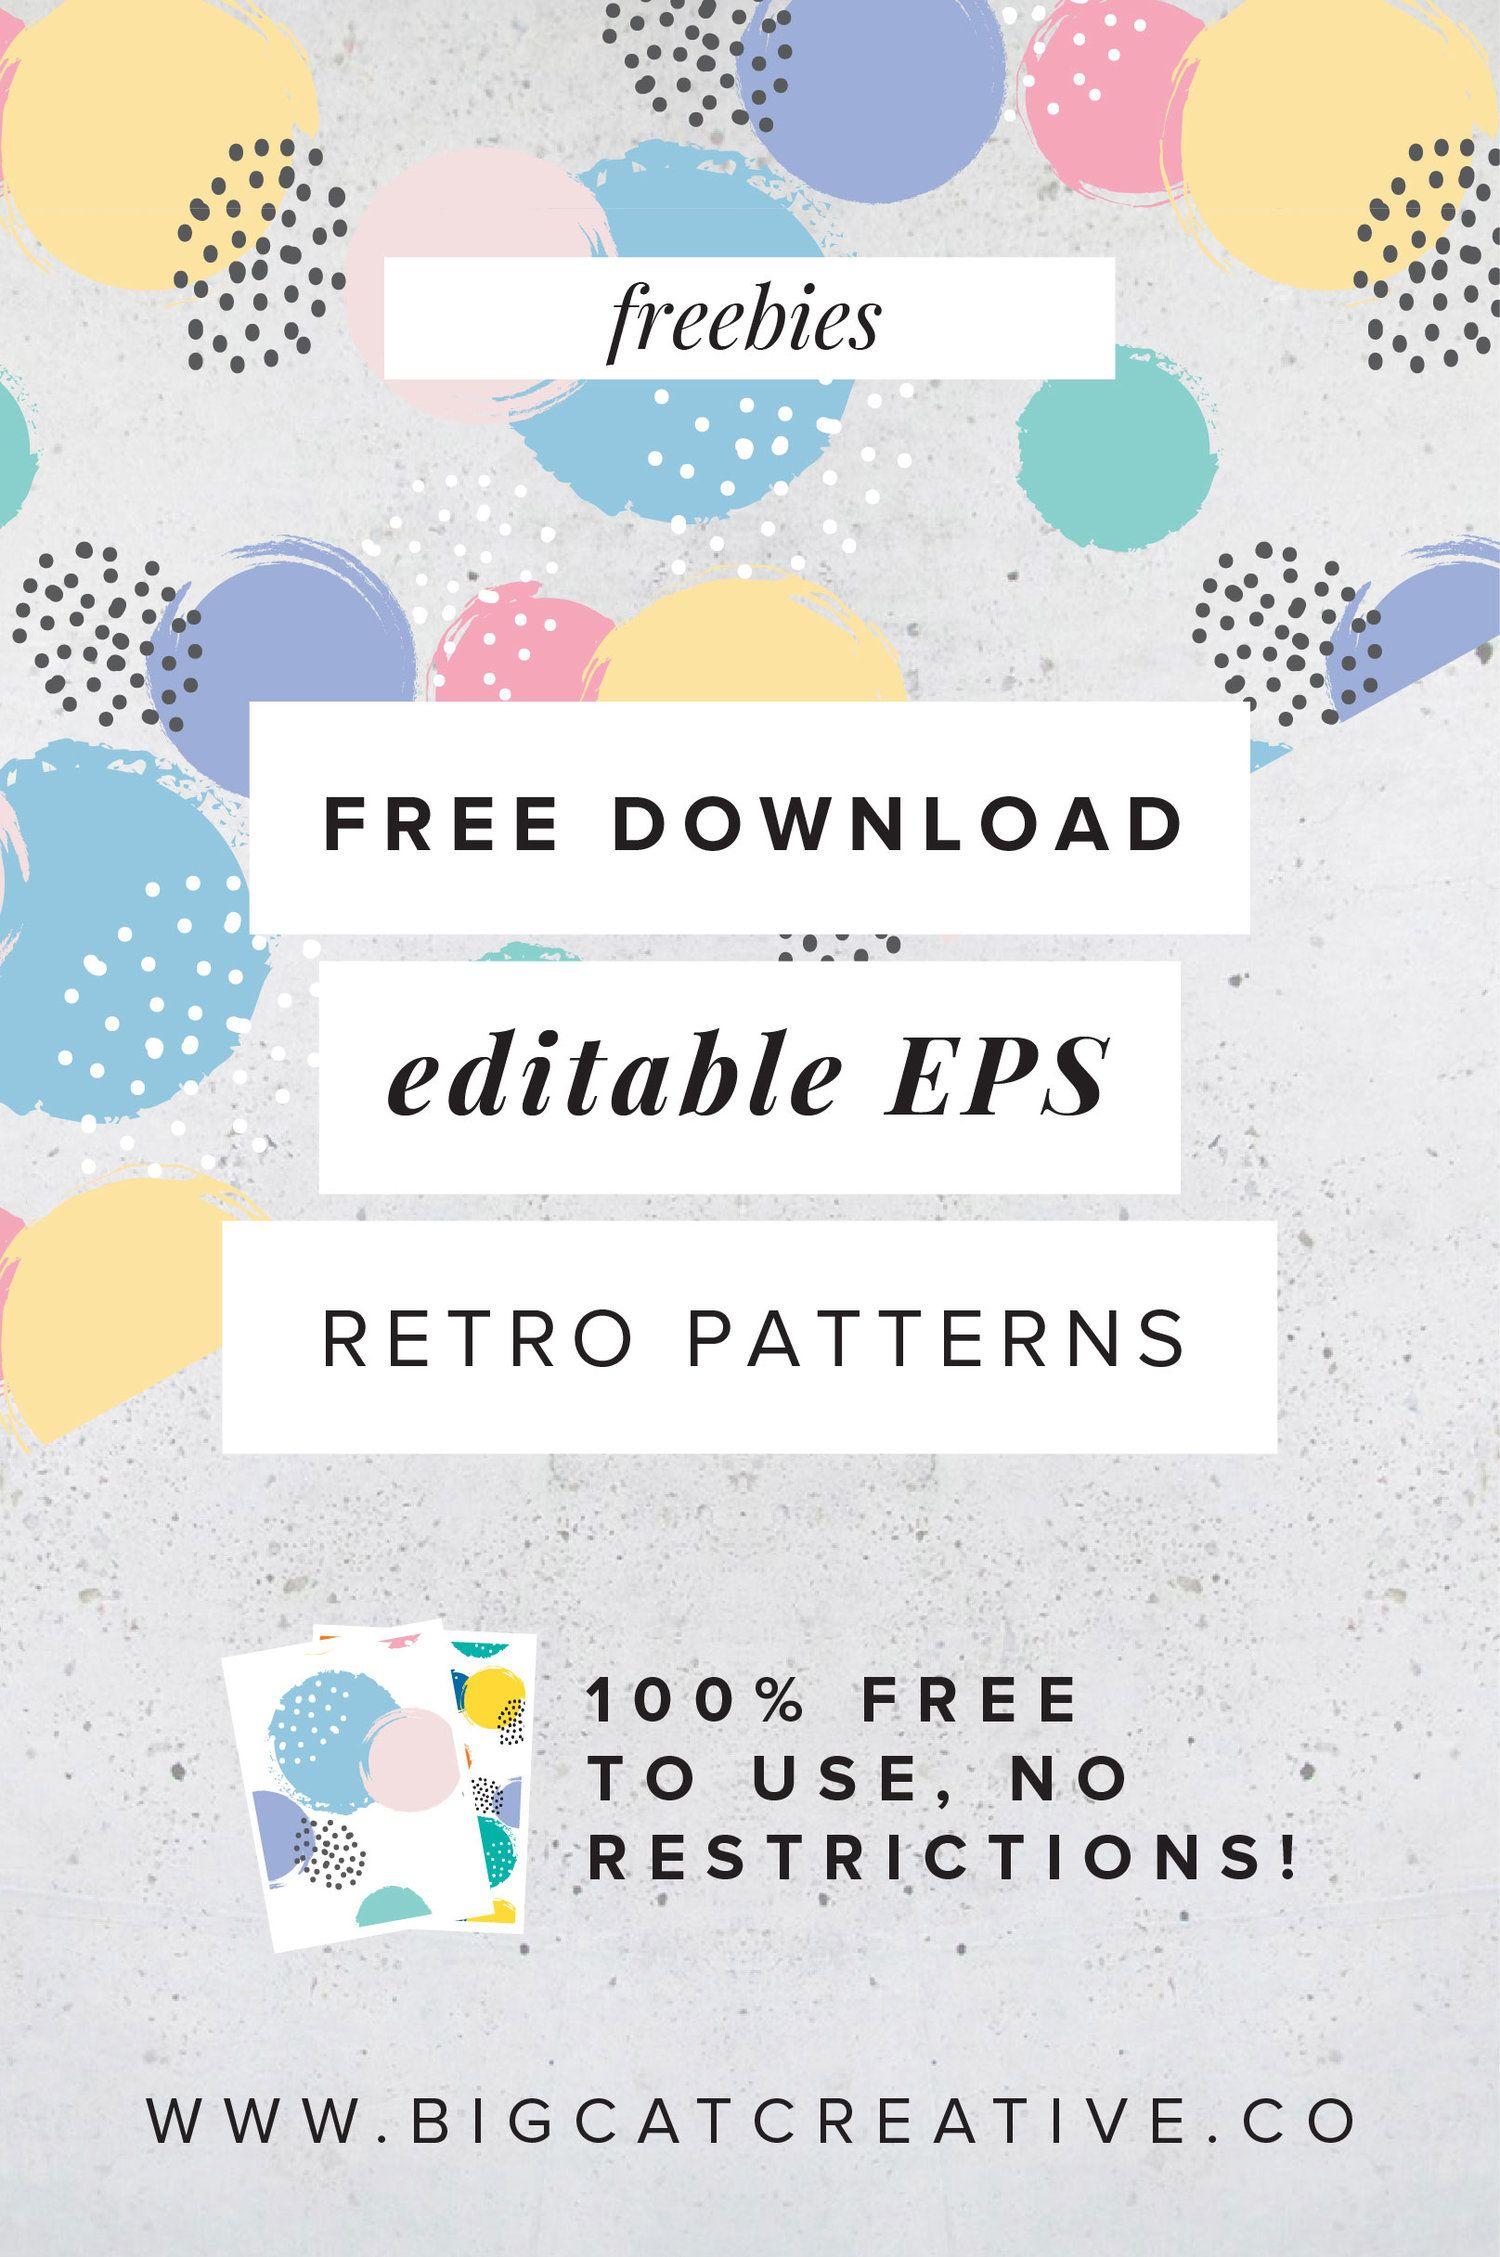 Freebie Retro Patterns Design Freebie Free Graphic Design